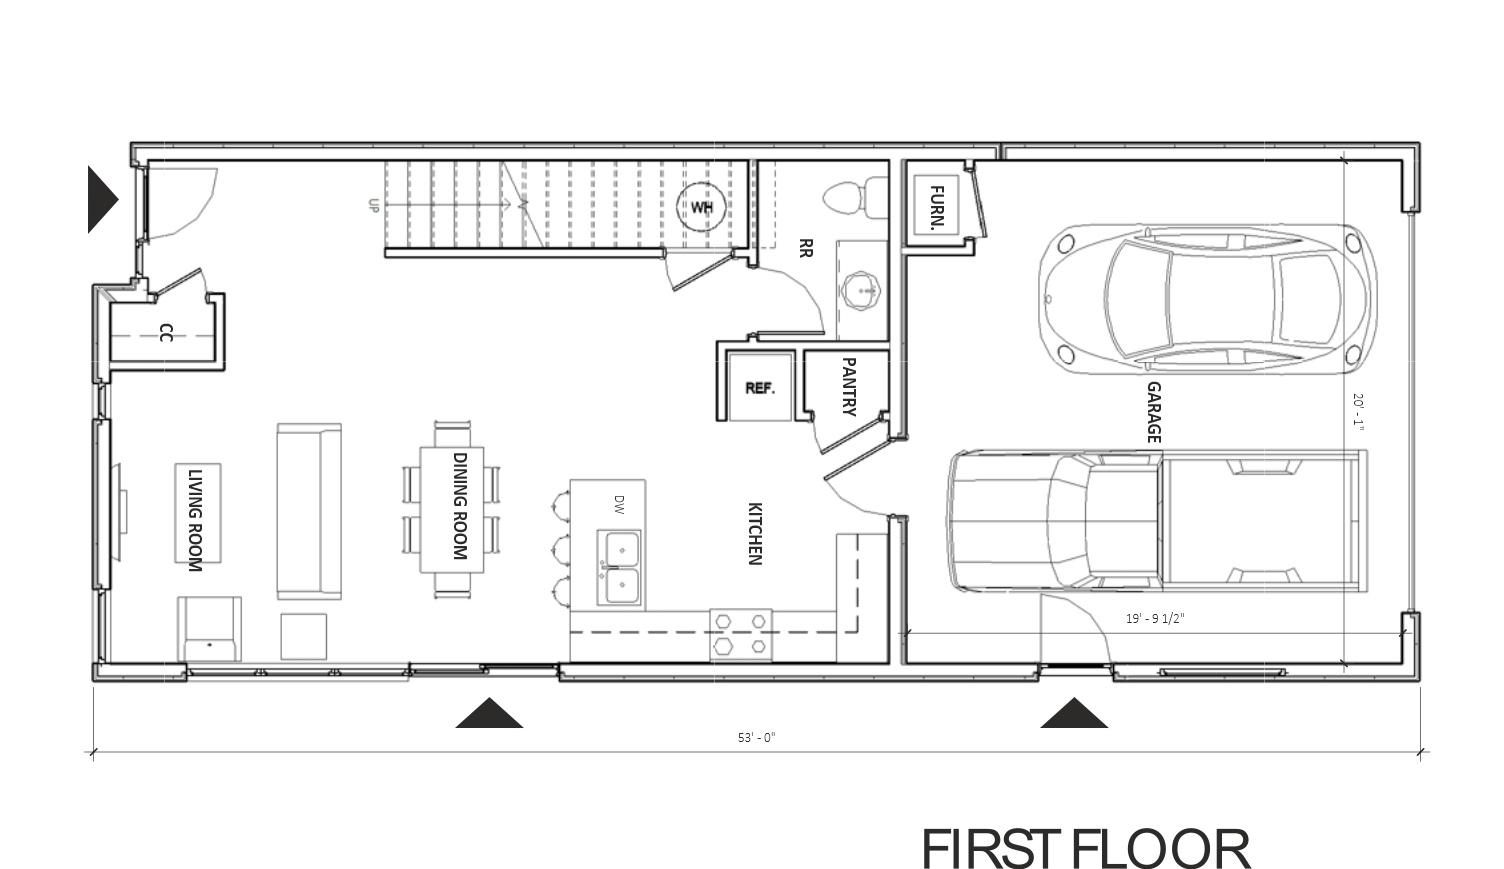 DRAW Mount Prospect Homes - UC-B Properties